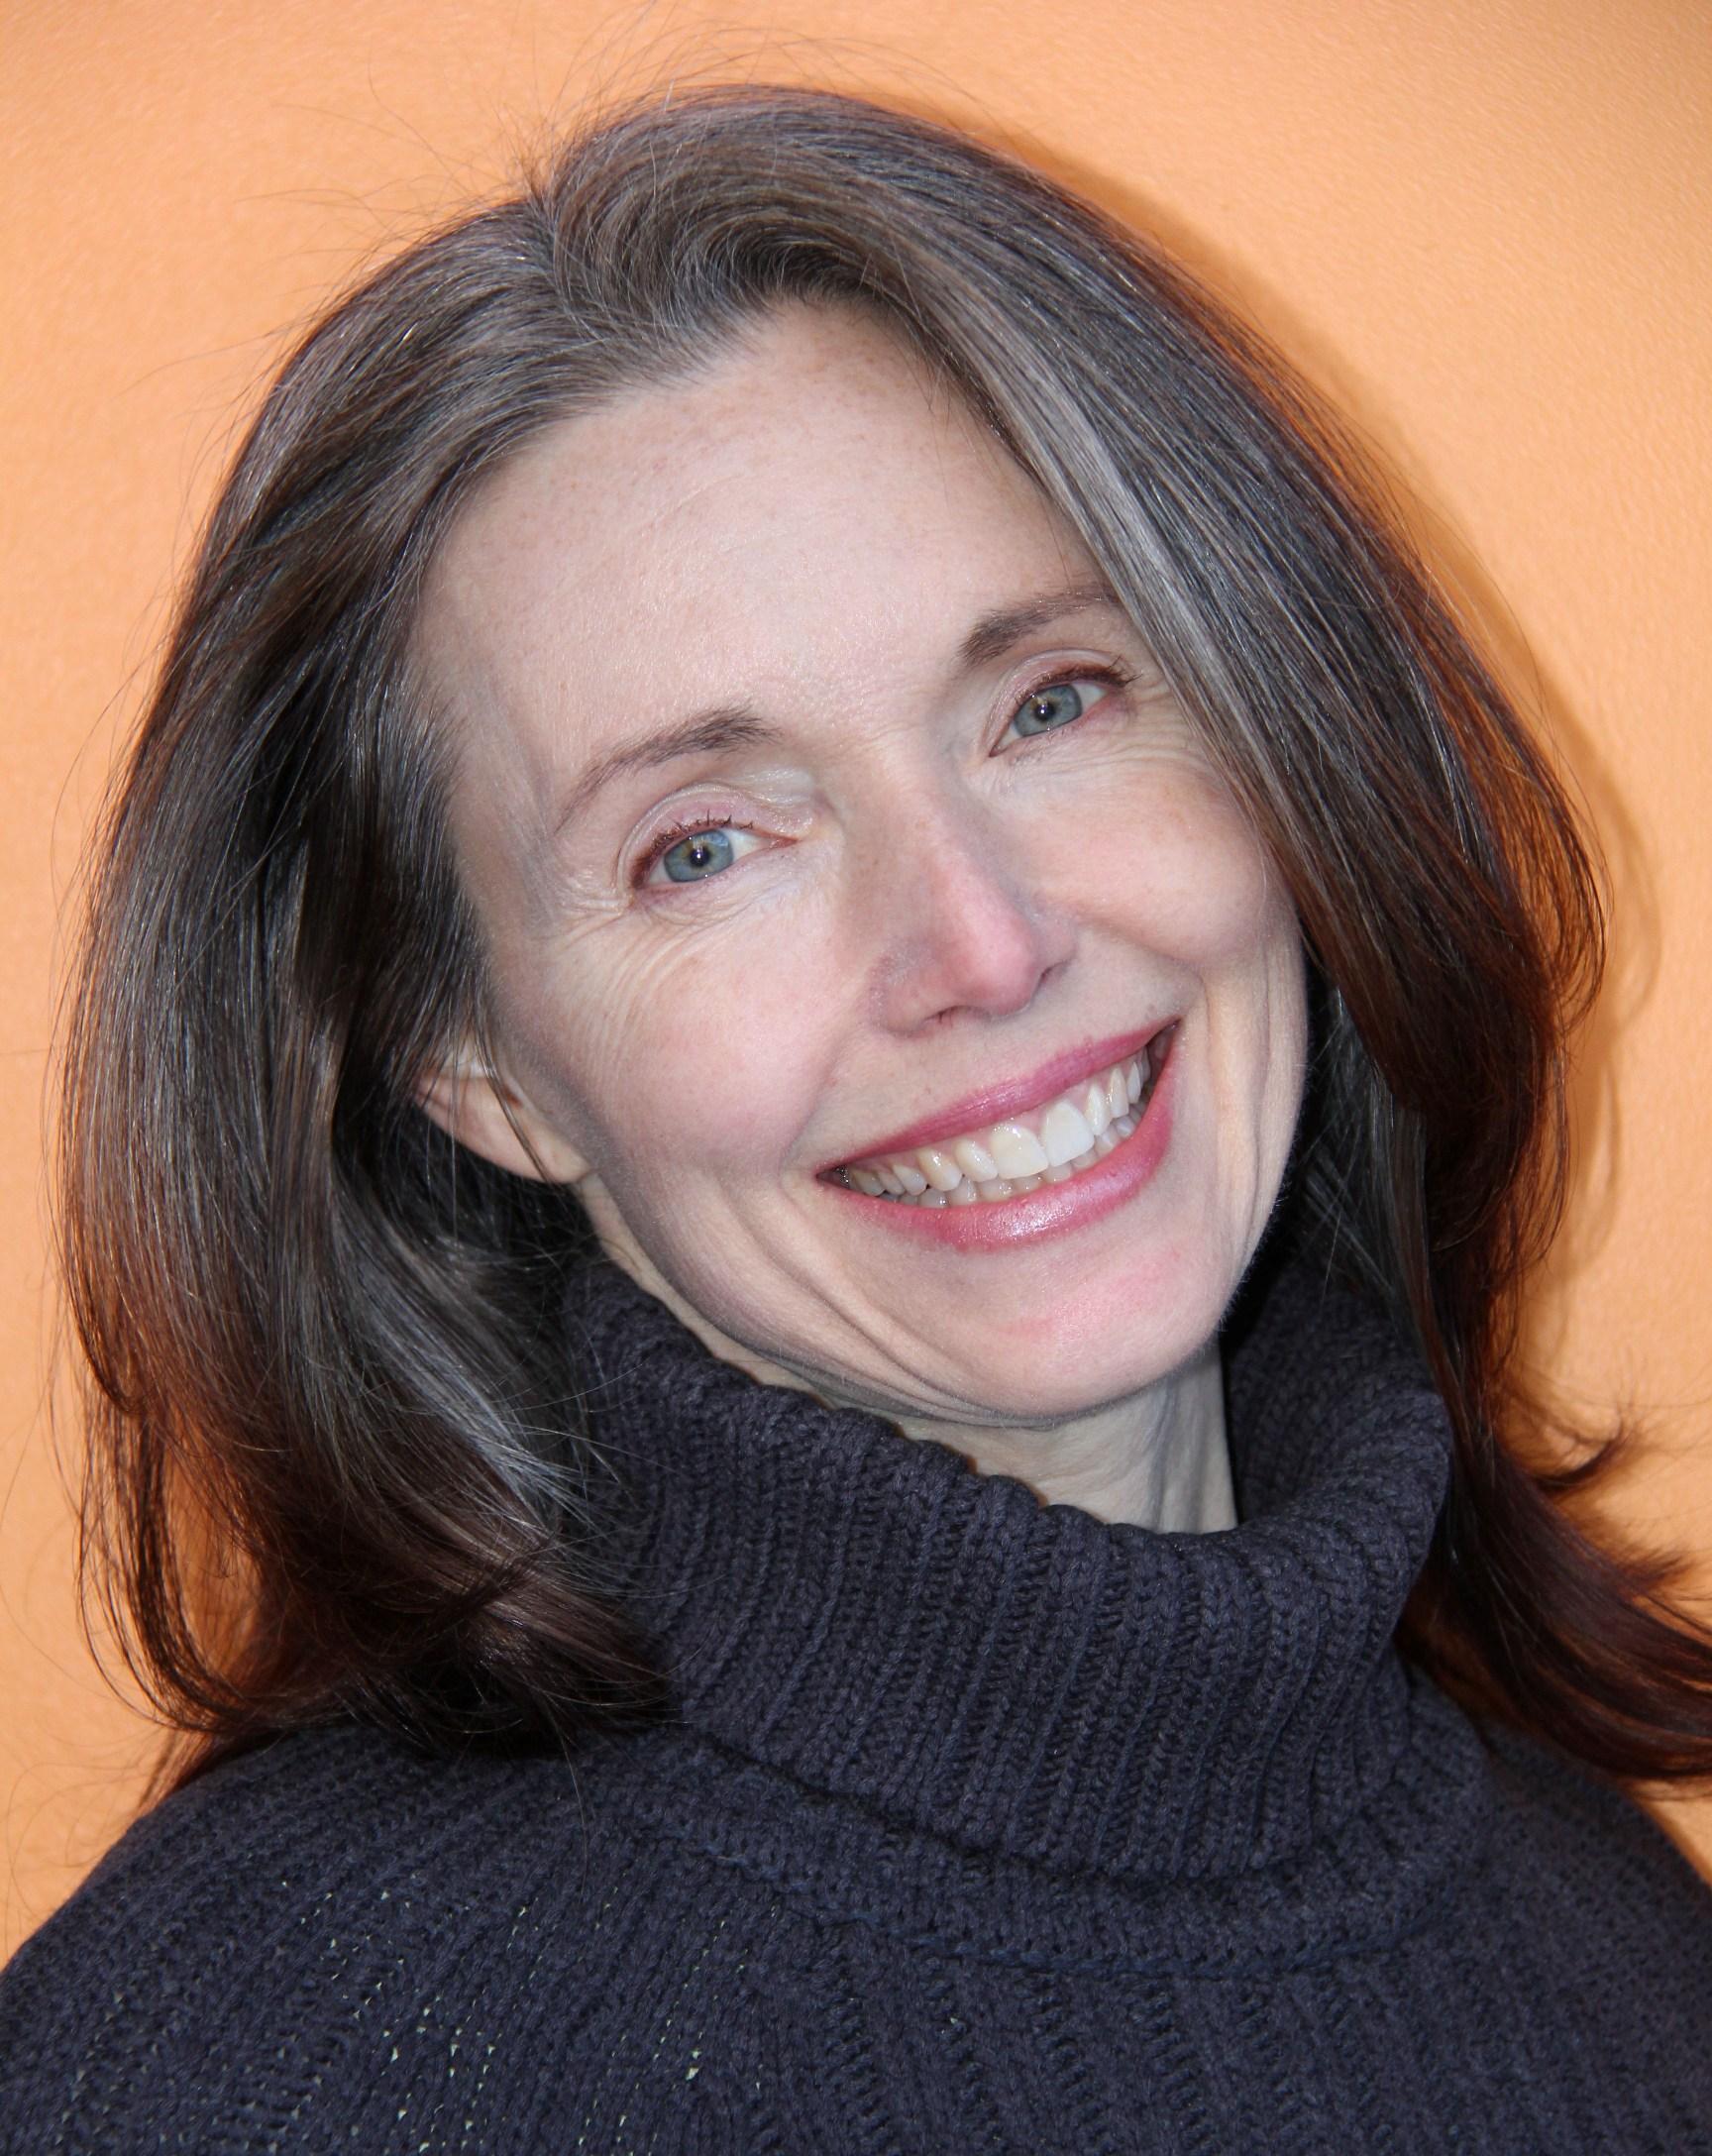 Cheryl Millett